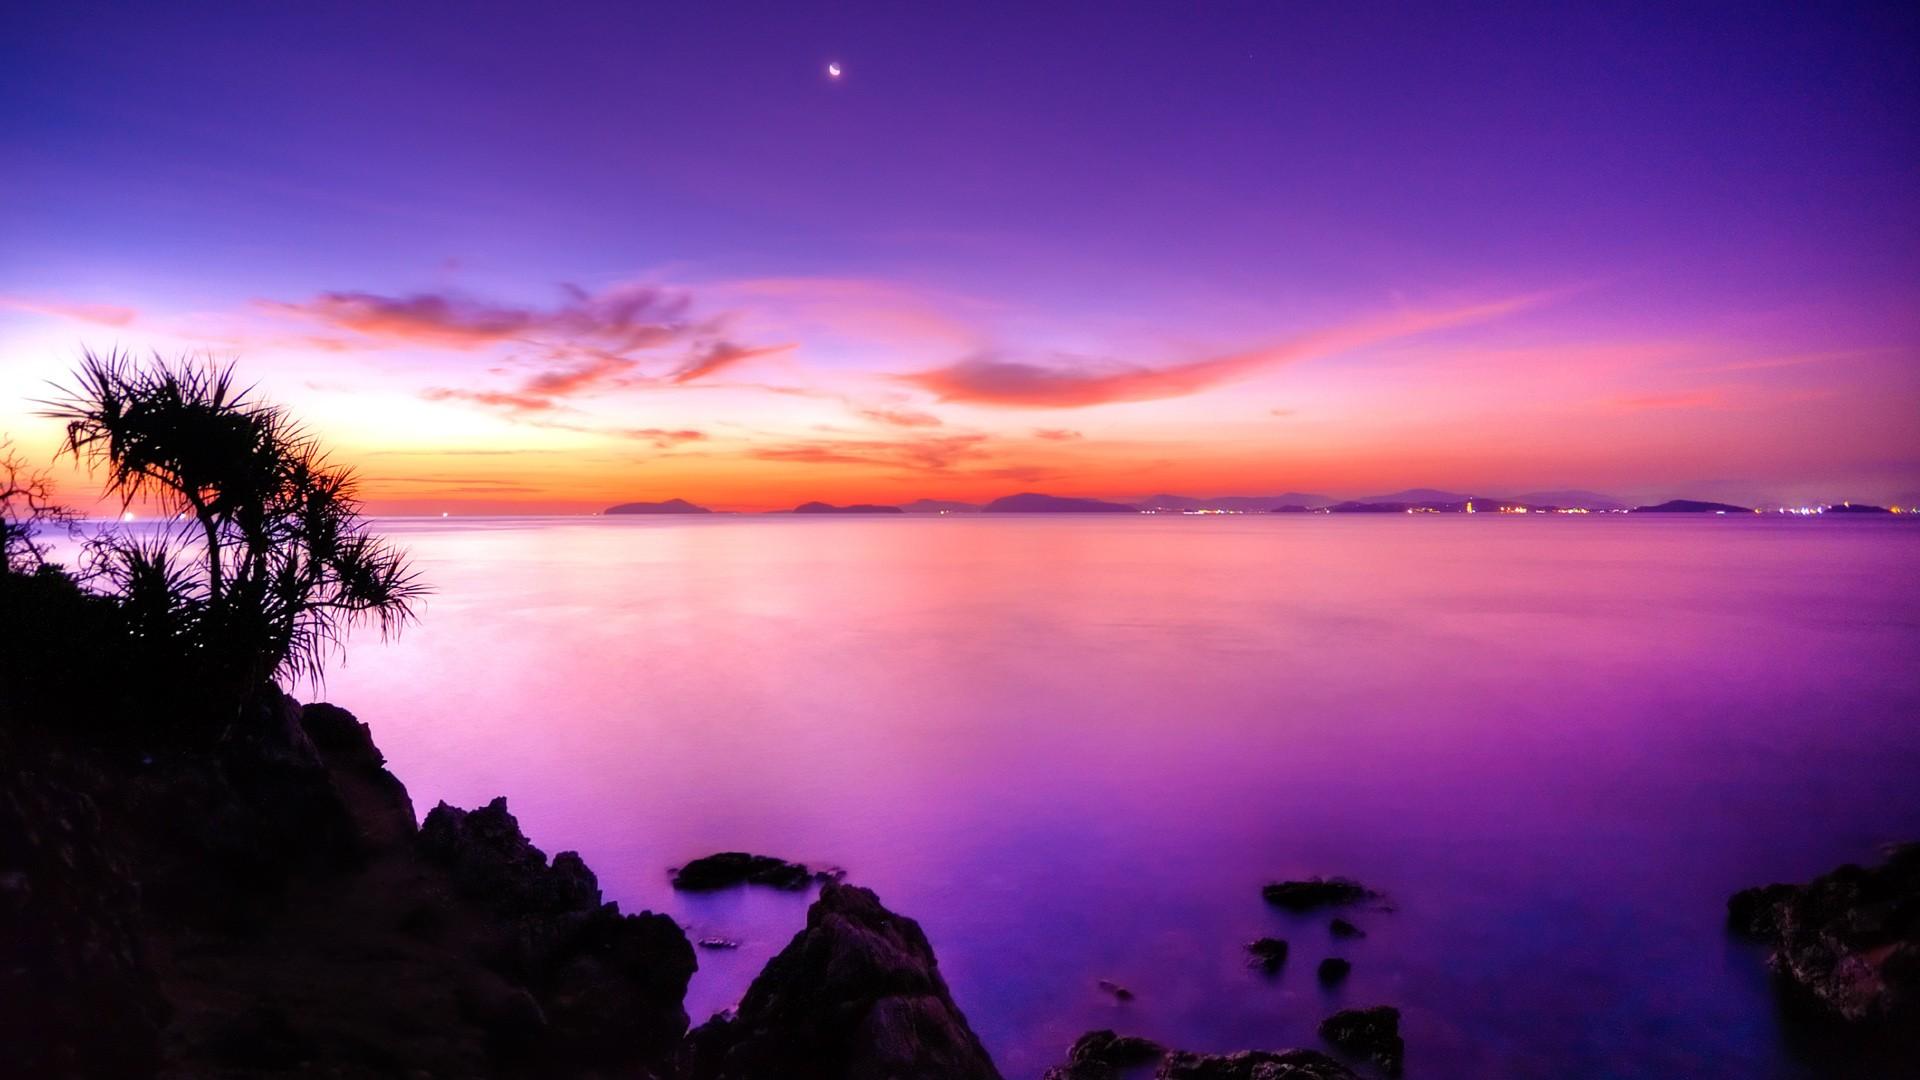 Purple Sunset desktop wallpaper download